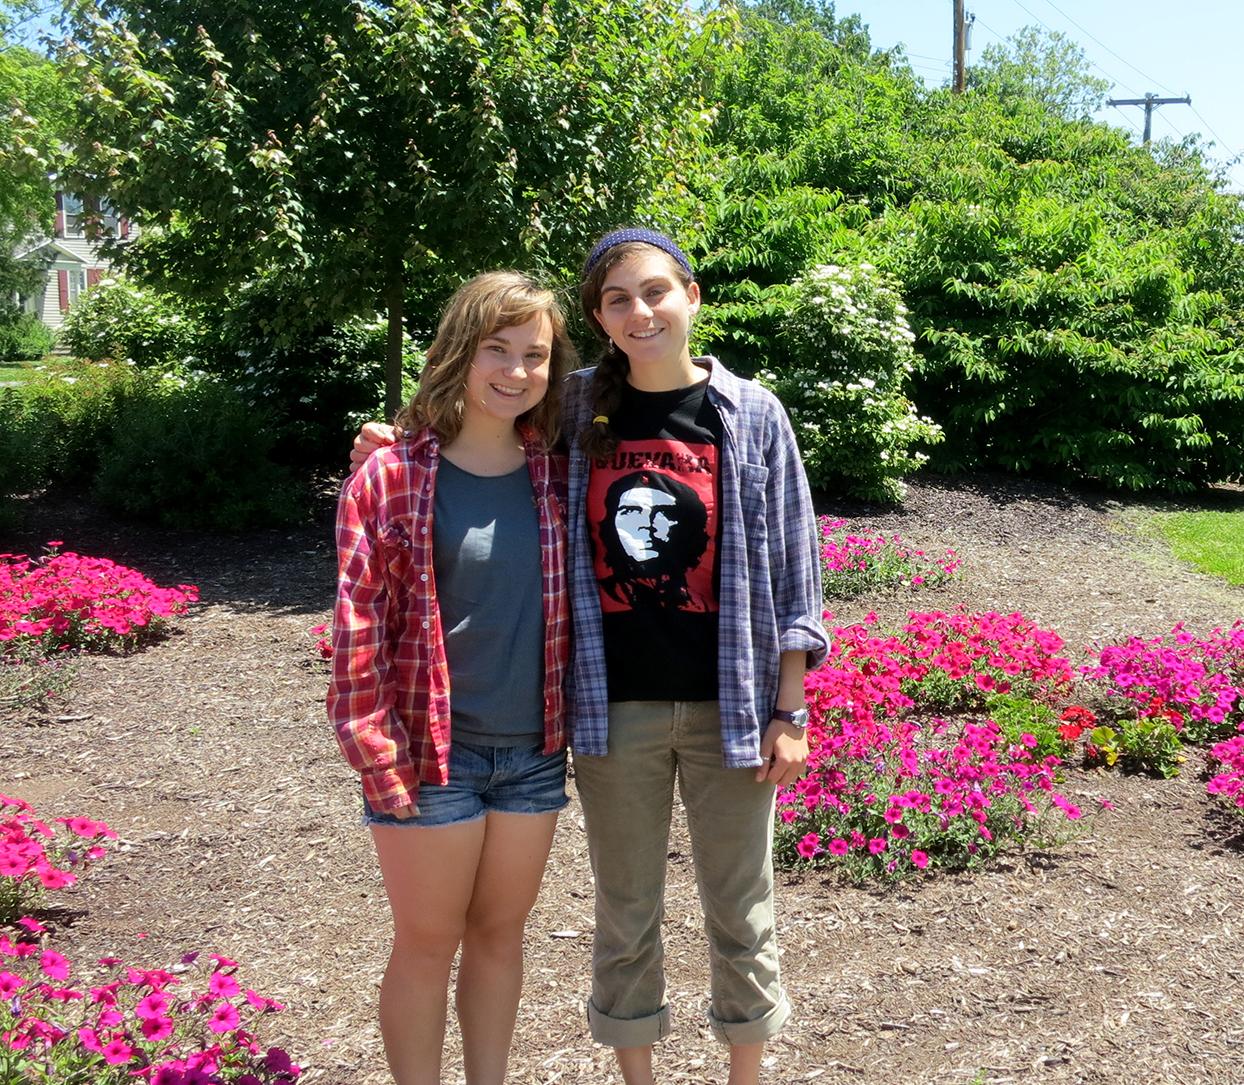 Kerri Grimaldi '15 and Deanna Nappi '15.